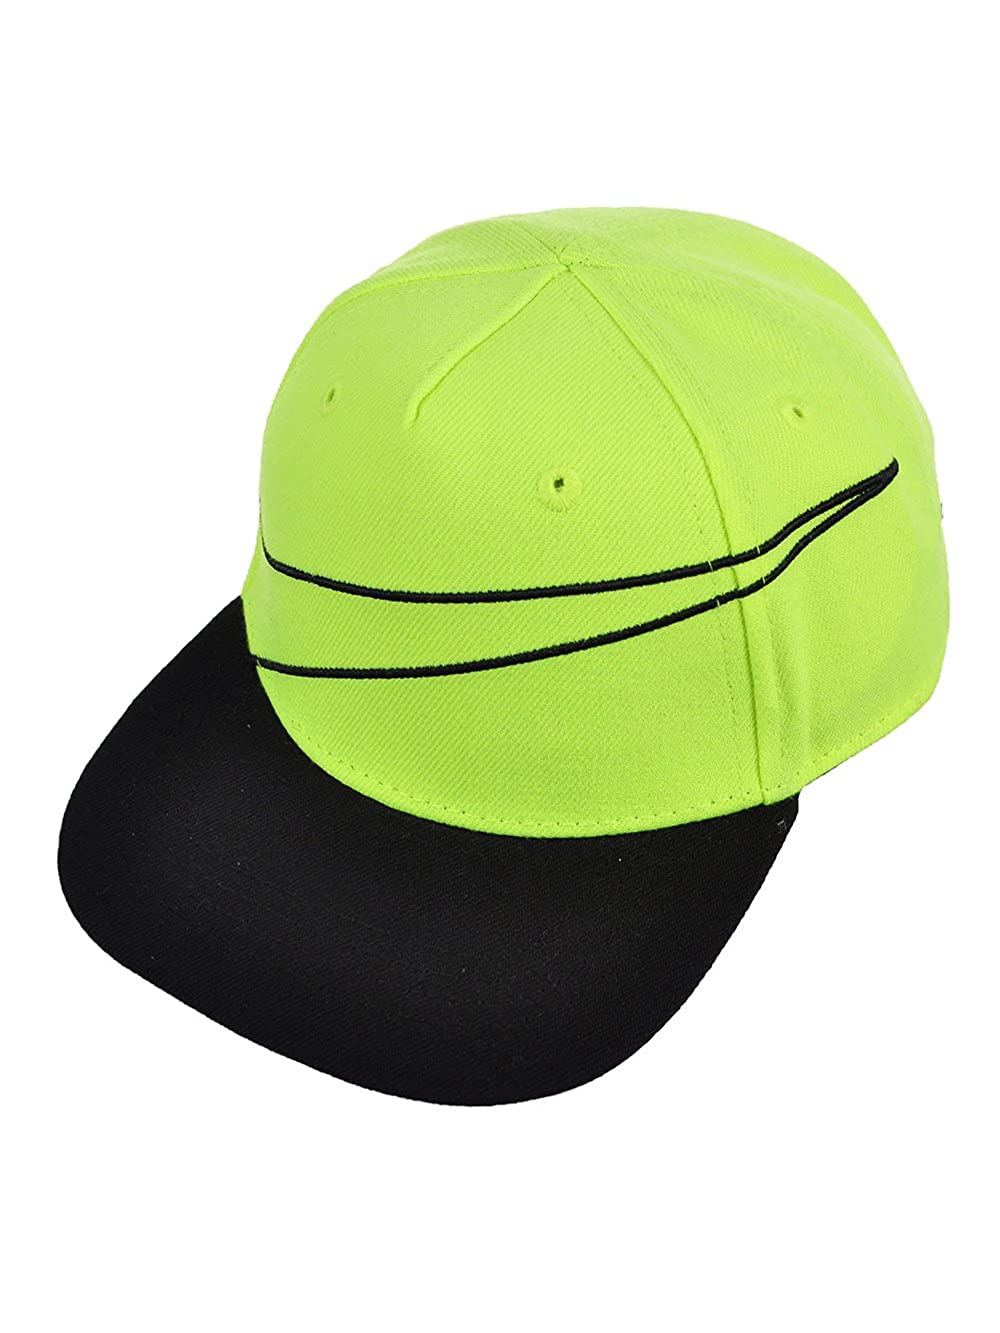 Nike Baby Boys' Snapback Cap 12-24 months